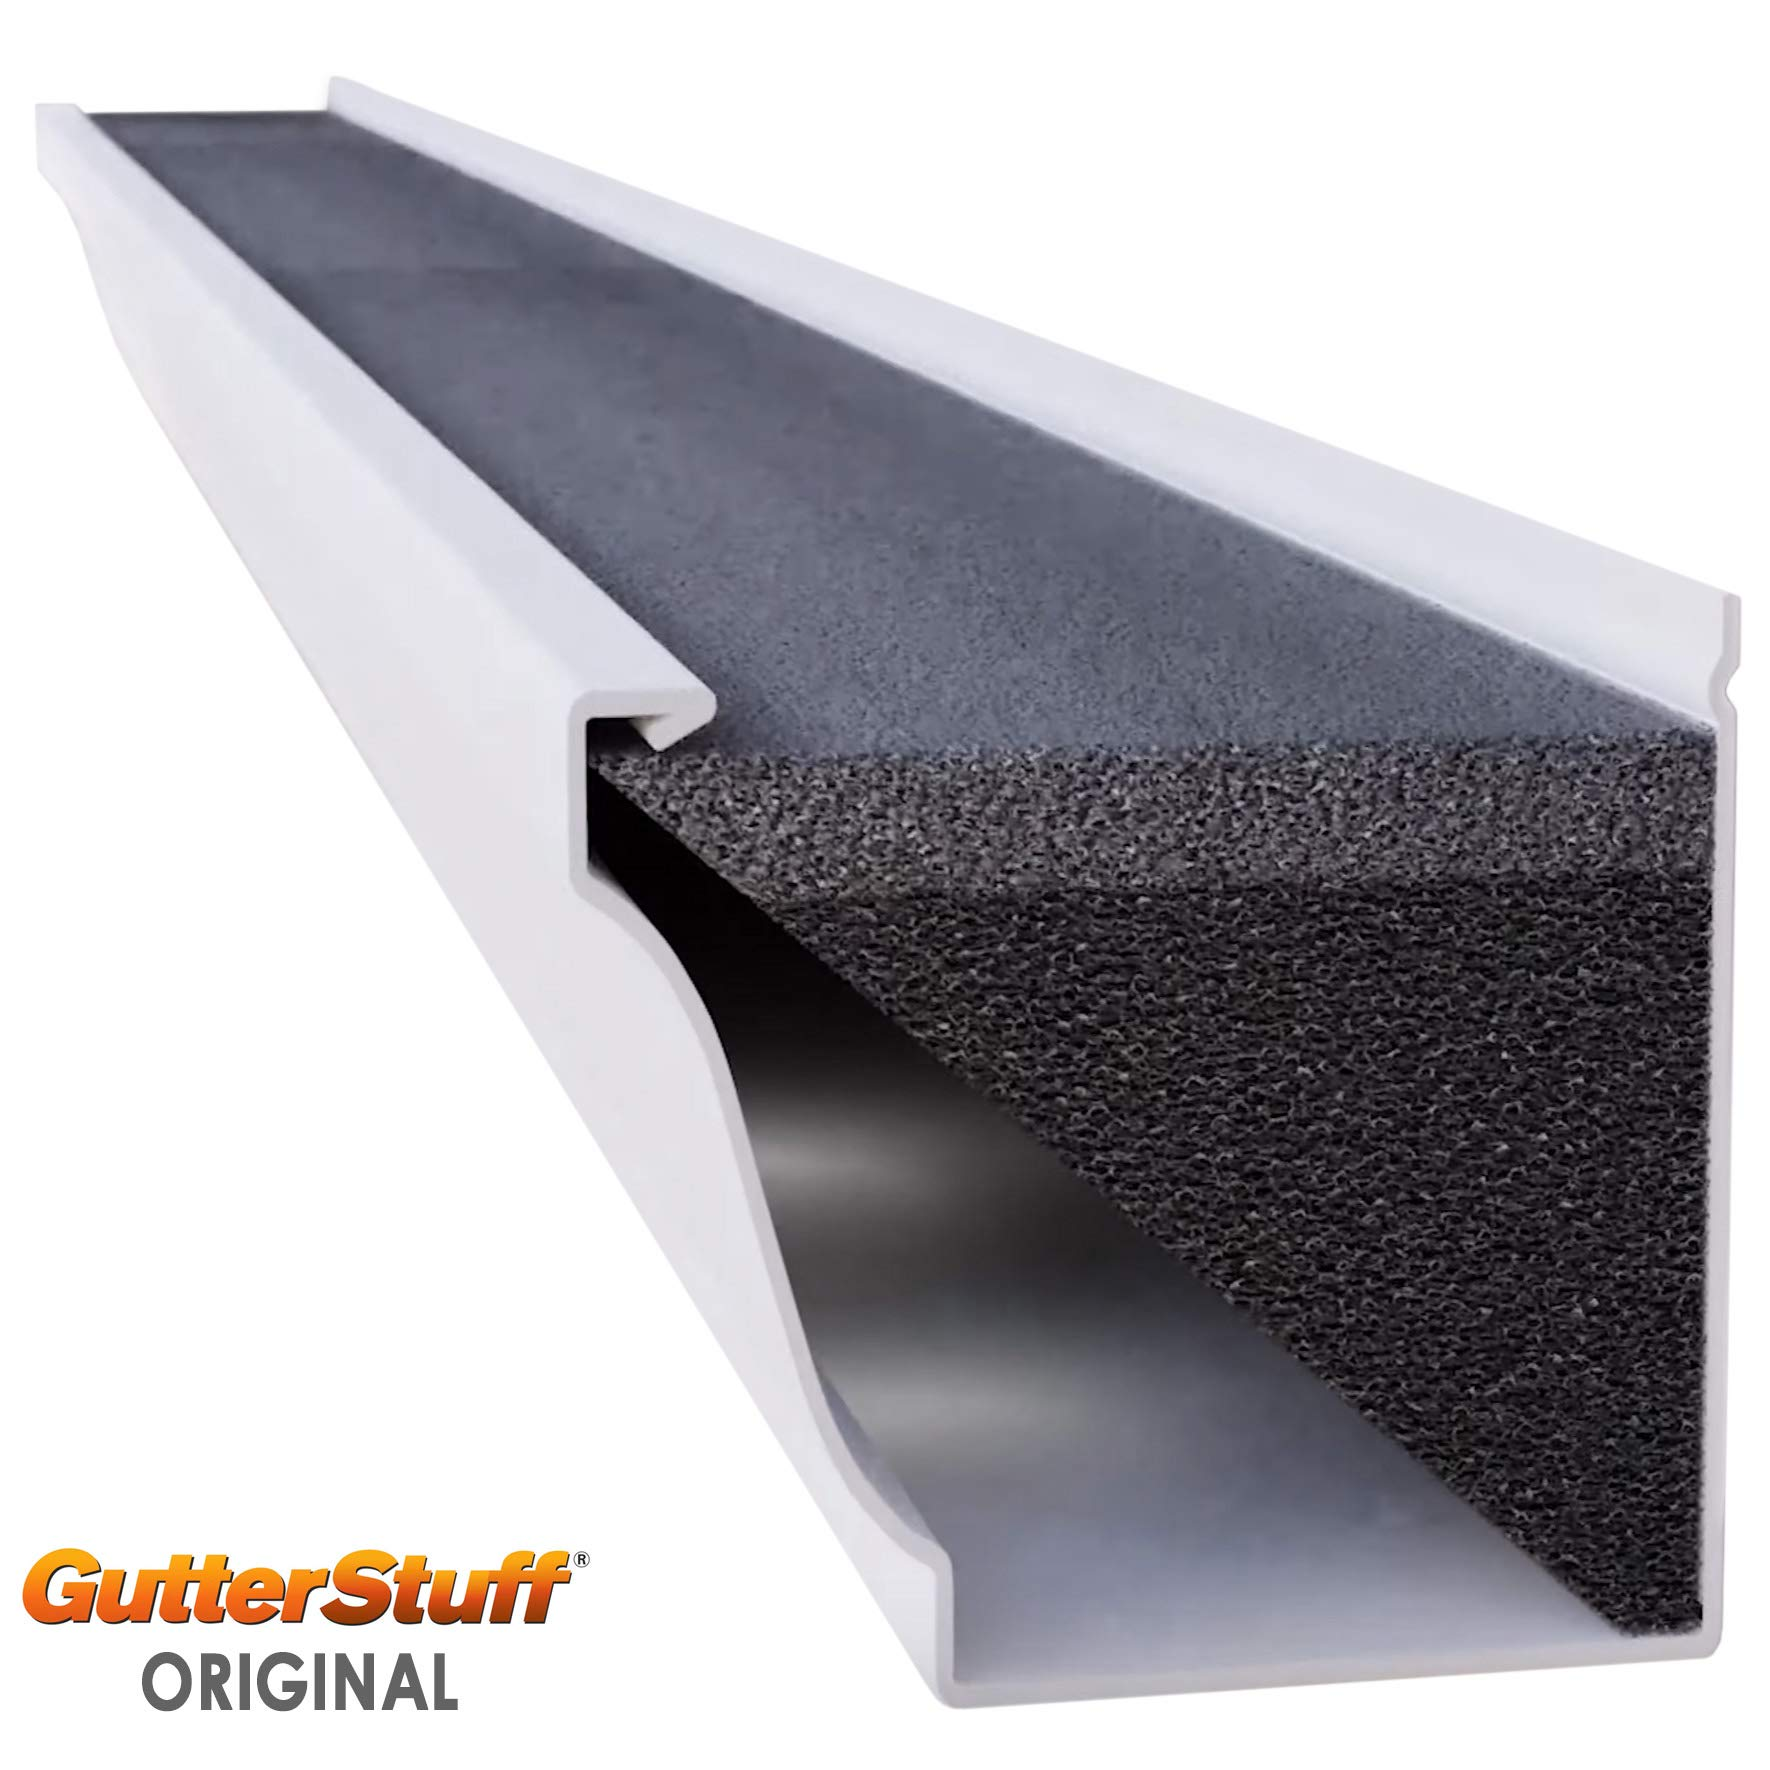 GutterStuff Guard 5-Inch K Style Foam Gutter Filter Insert with Year Round Leaf Protection & Easy DIY Installation, 8 x 4' (32-feet) by GutterStuff